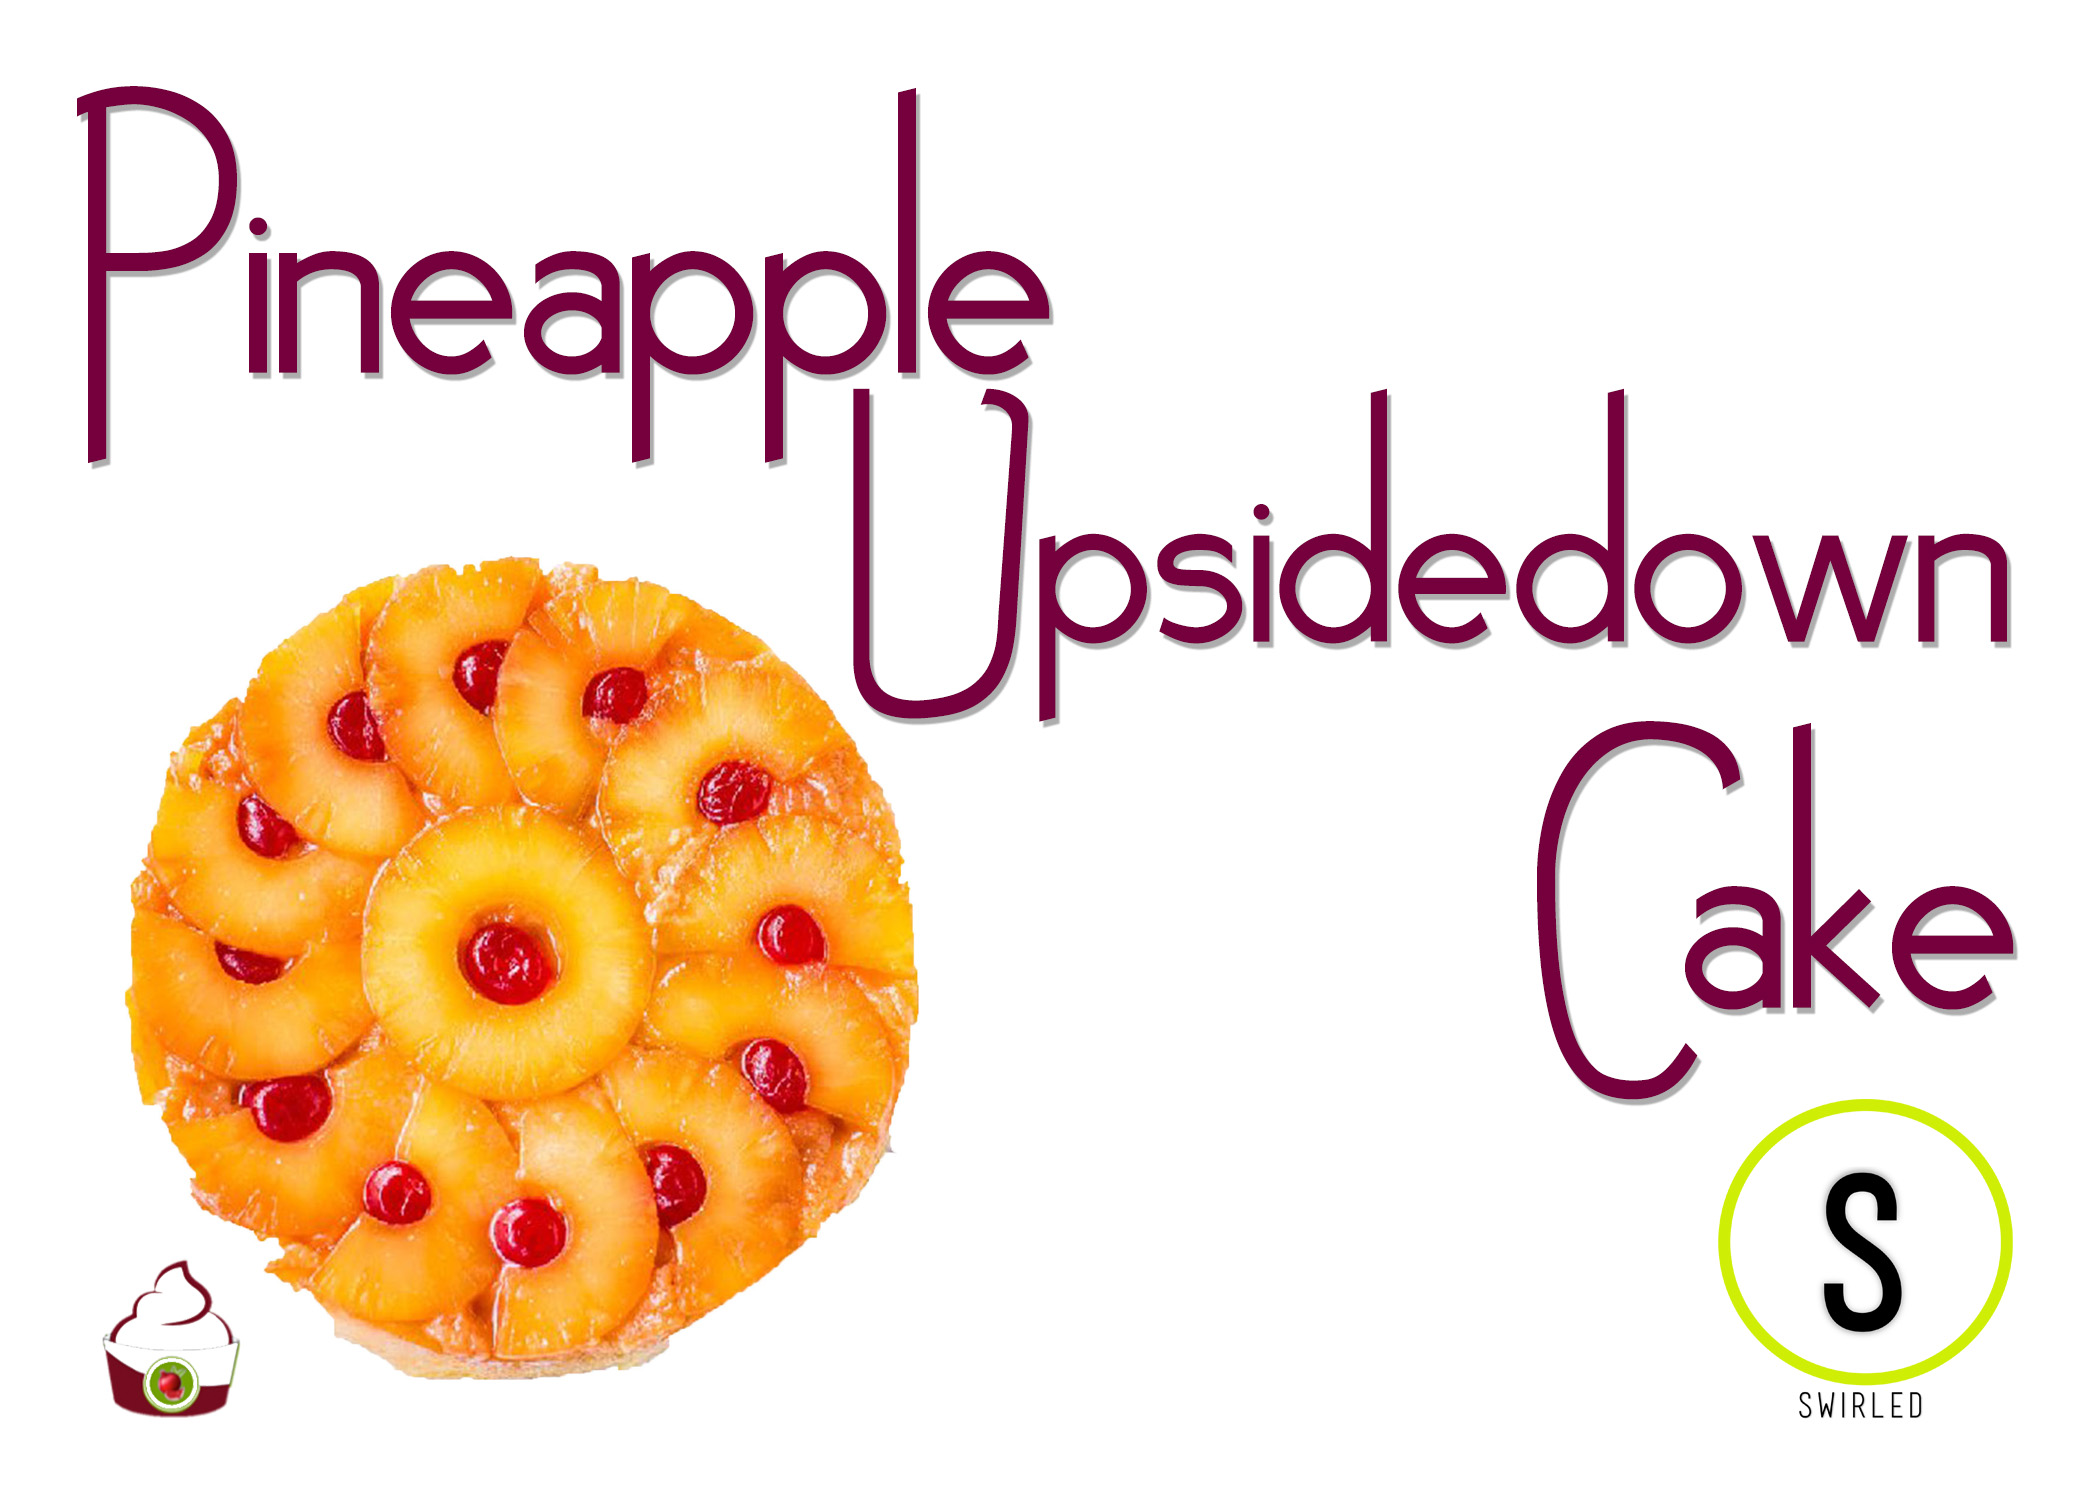 pineapple upsidedown cake.jpg